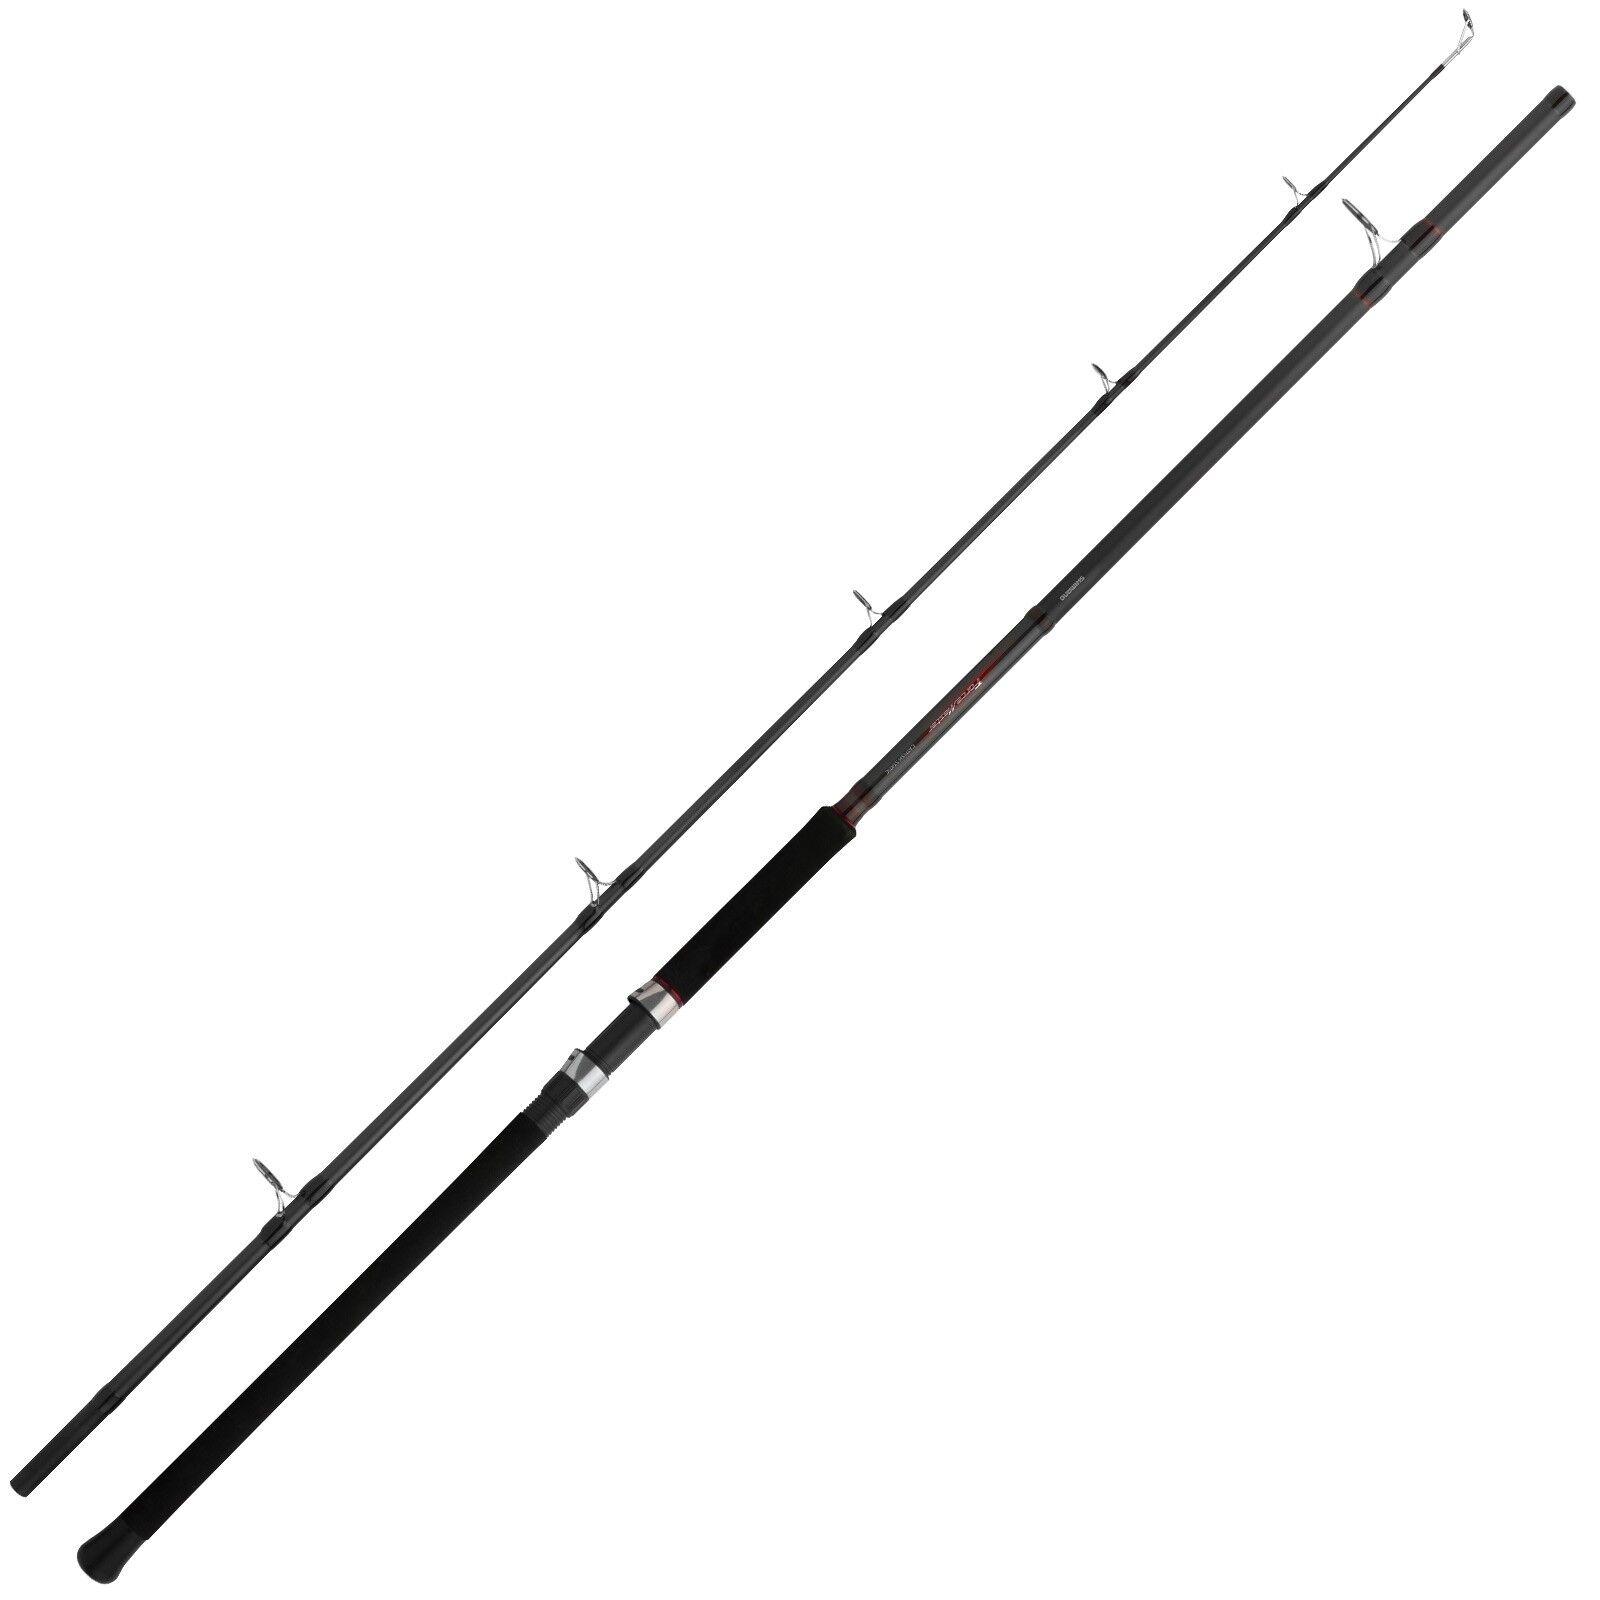 Shimano wallerrute Forcemaster Catfish Static 300 3,00m 3,00m 3,00m 500g daf728